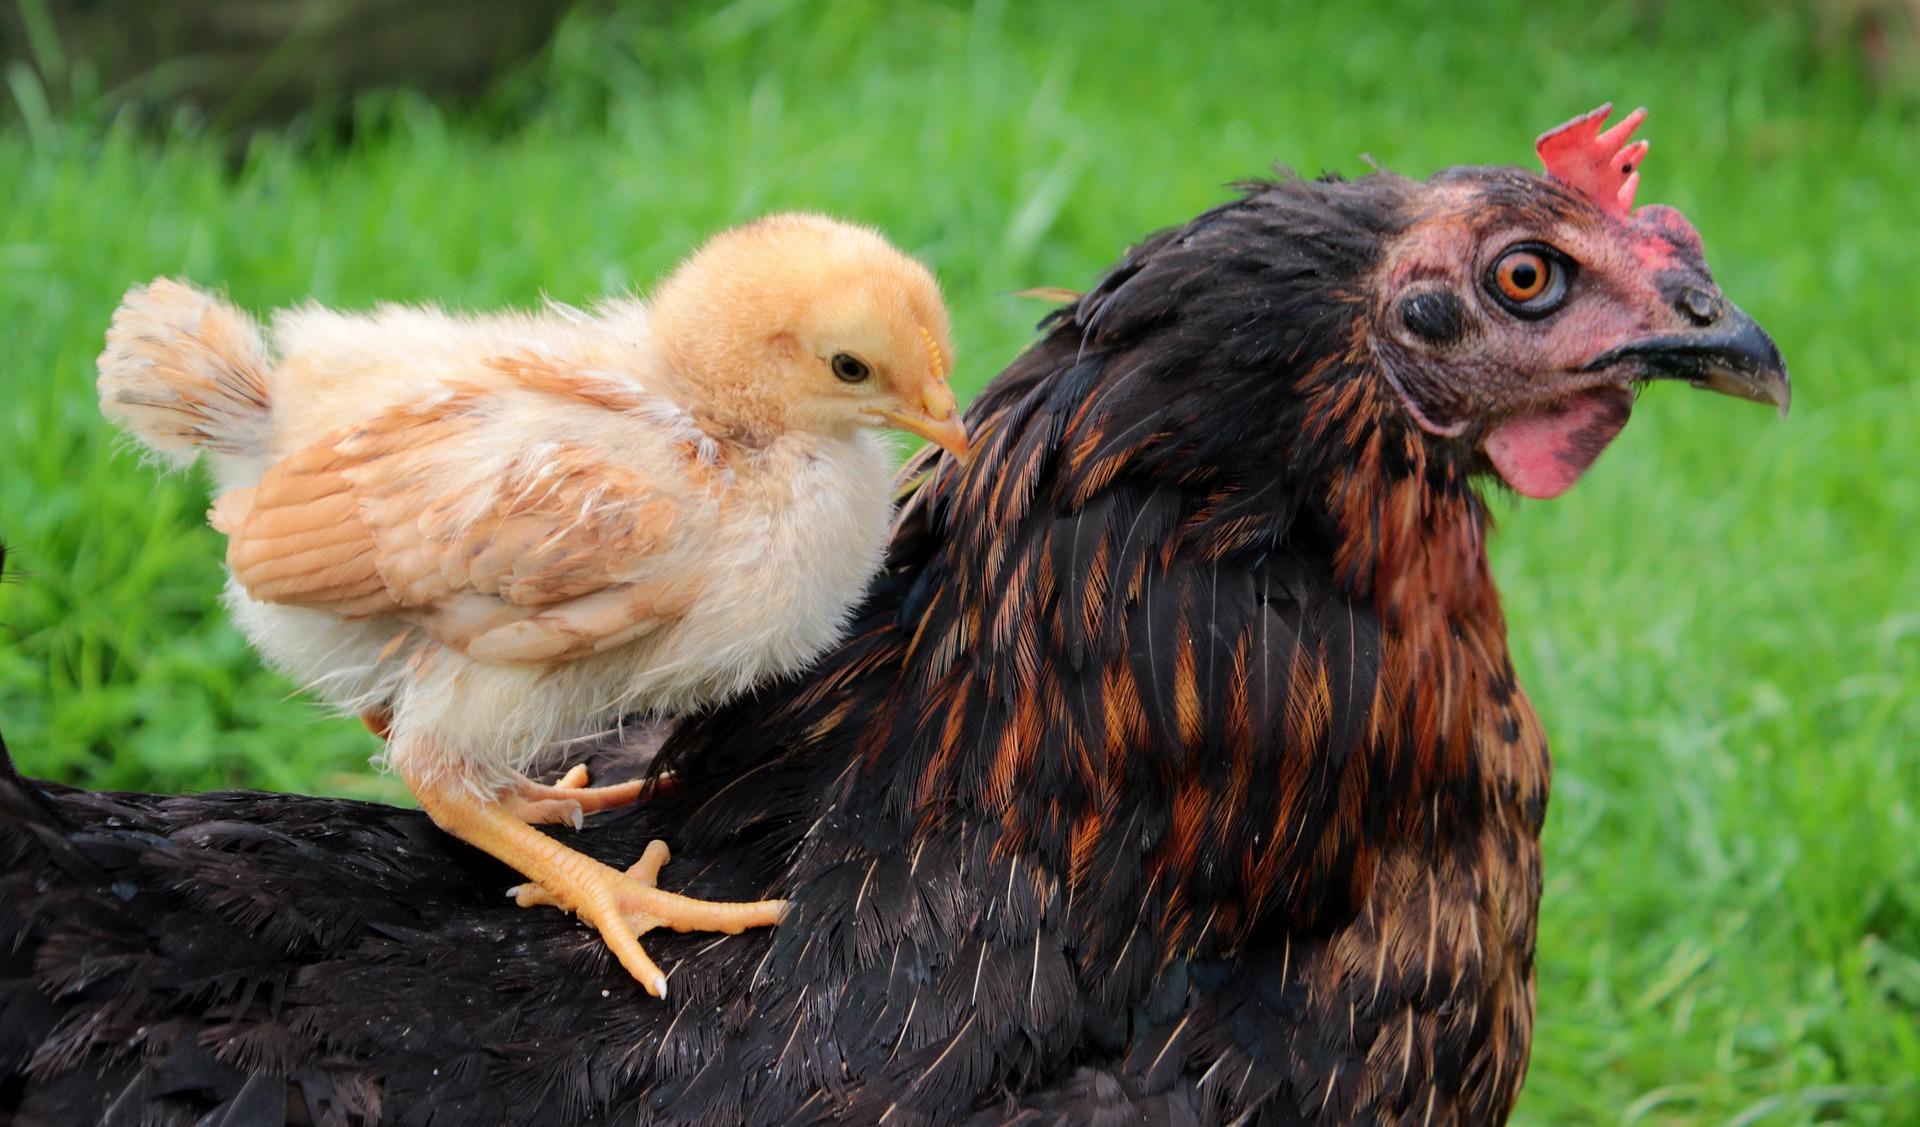 Little chick photo